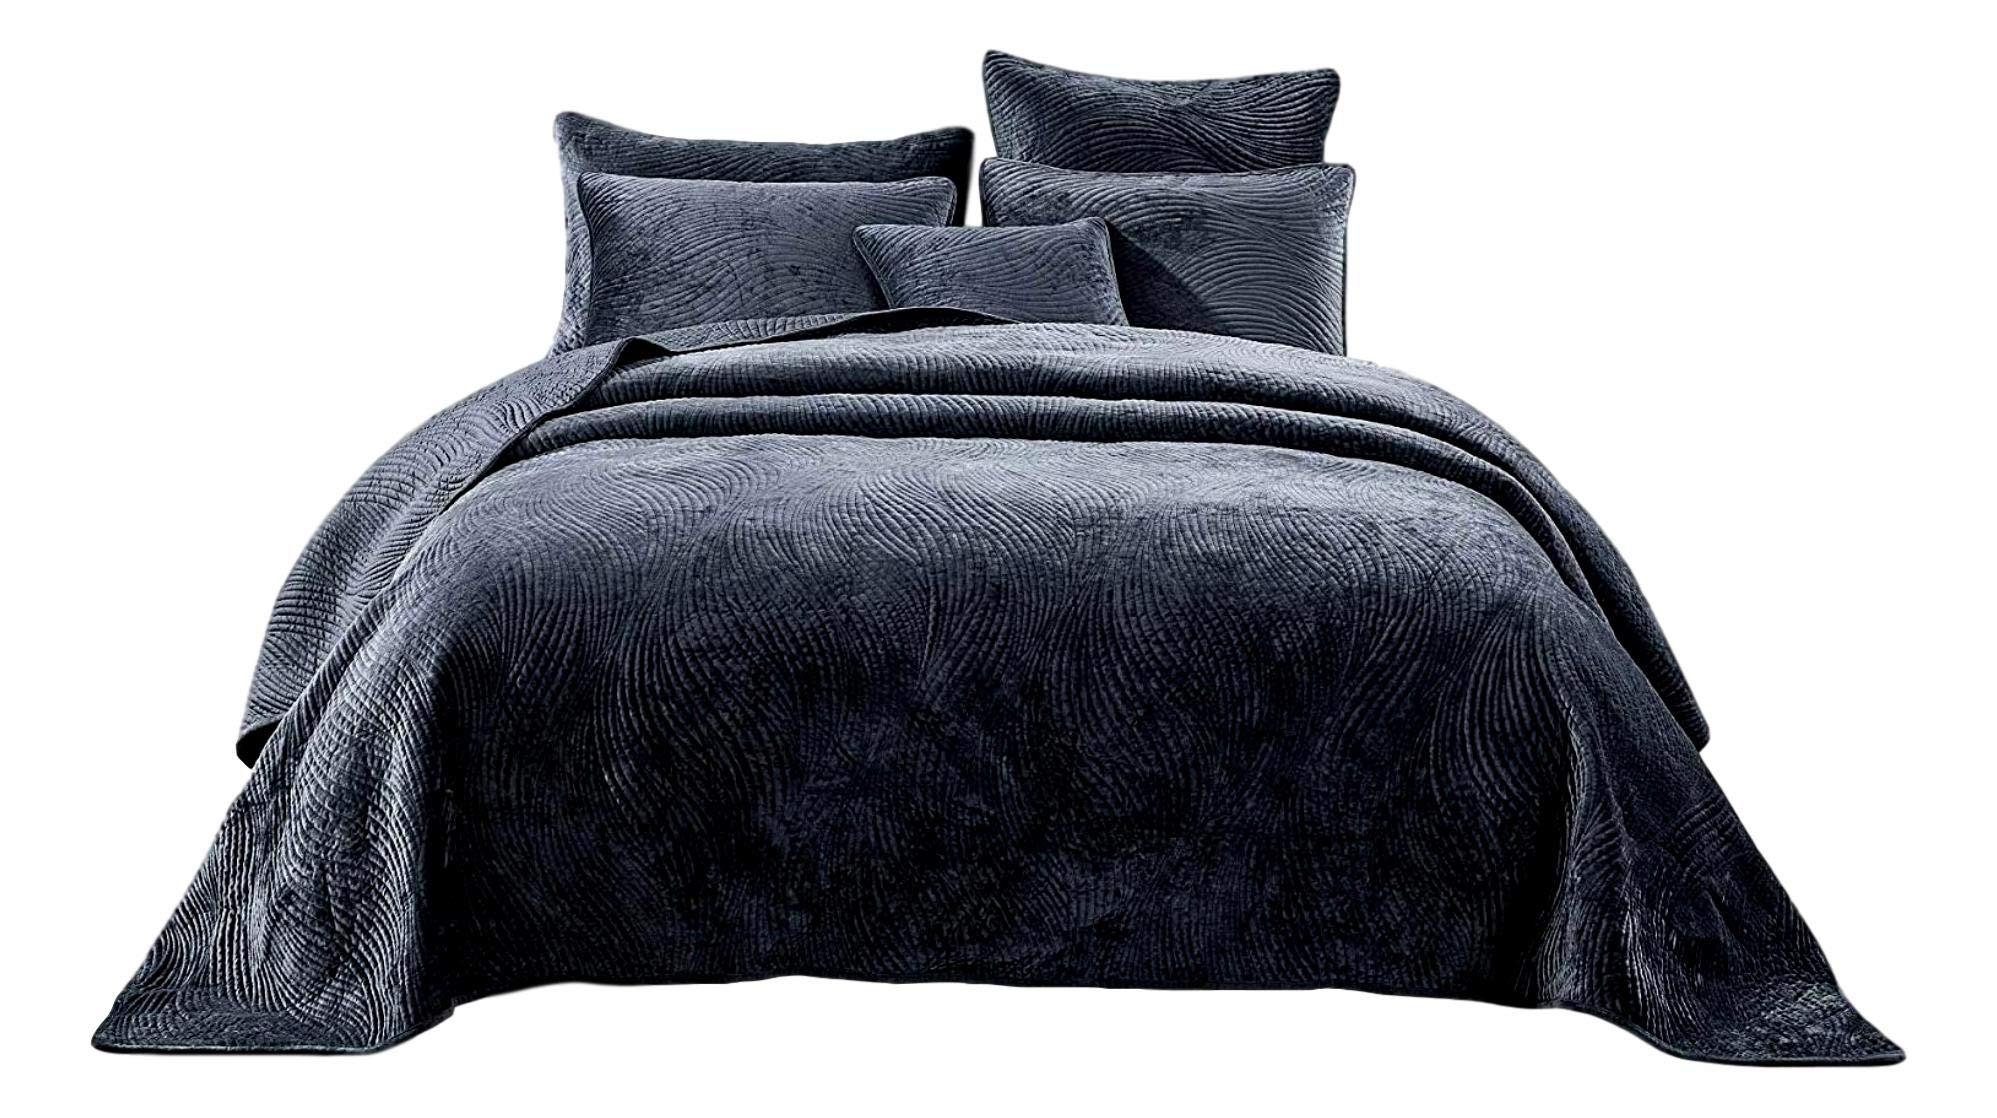 Tache Velvet Dreams Luxurious Velveteen Velour Super Soft Plush Warm Cozy Elegant Ripple Waves Stitch Quilted Coverlet Steel Navy Blue Bedspread Set, Queen